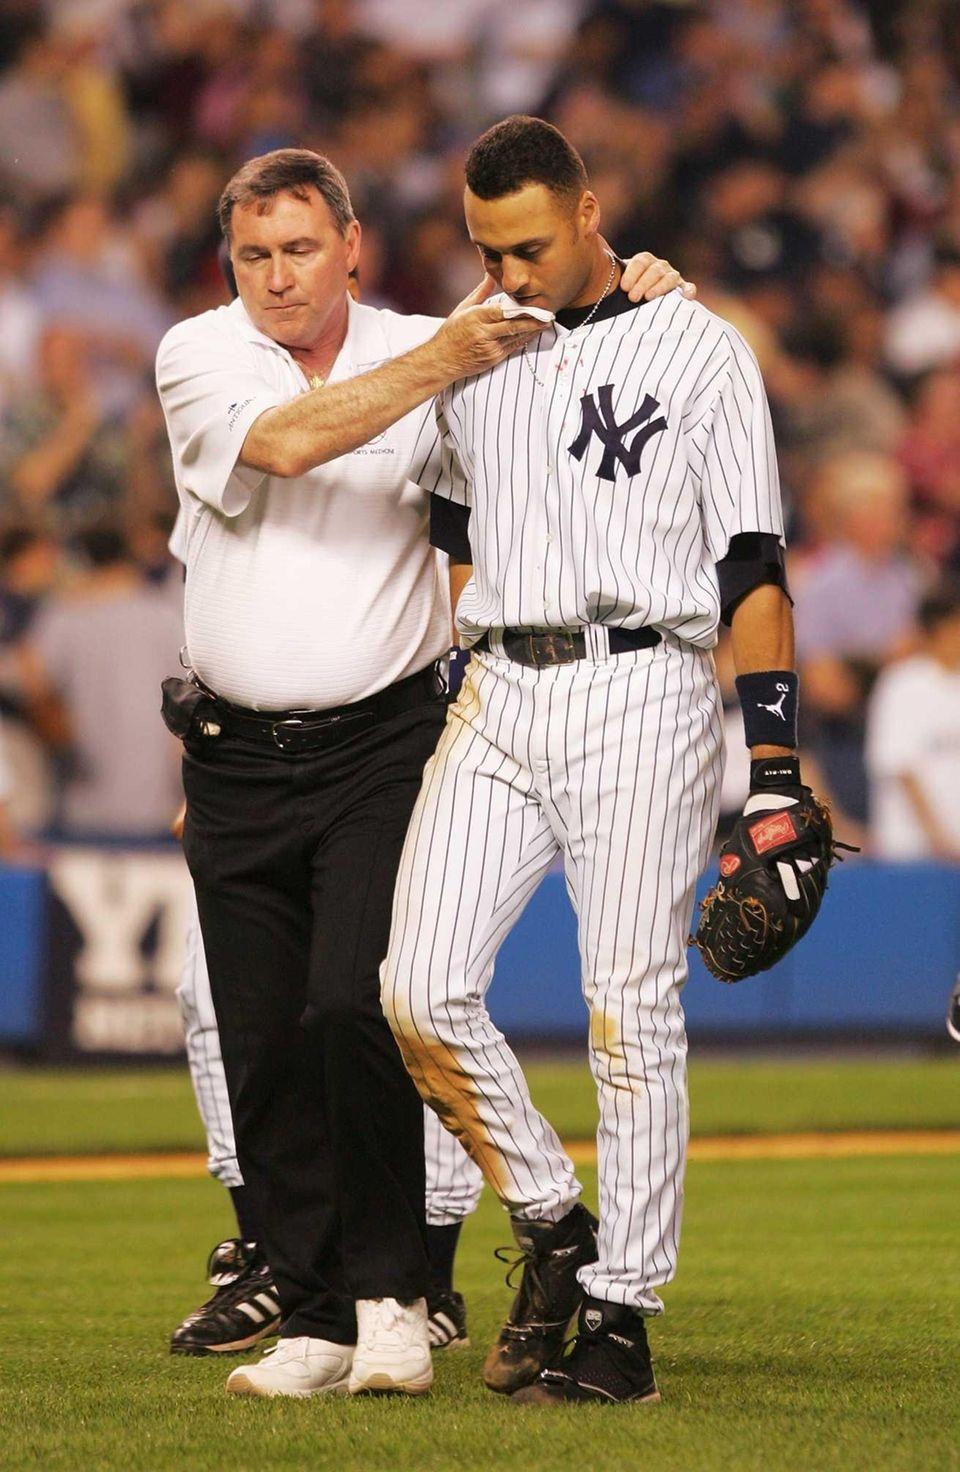 Trainer Gene Monahan helps Derek Jeter of the